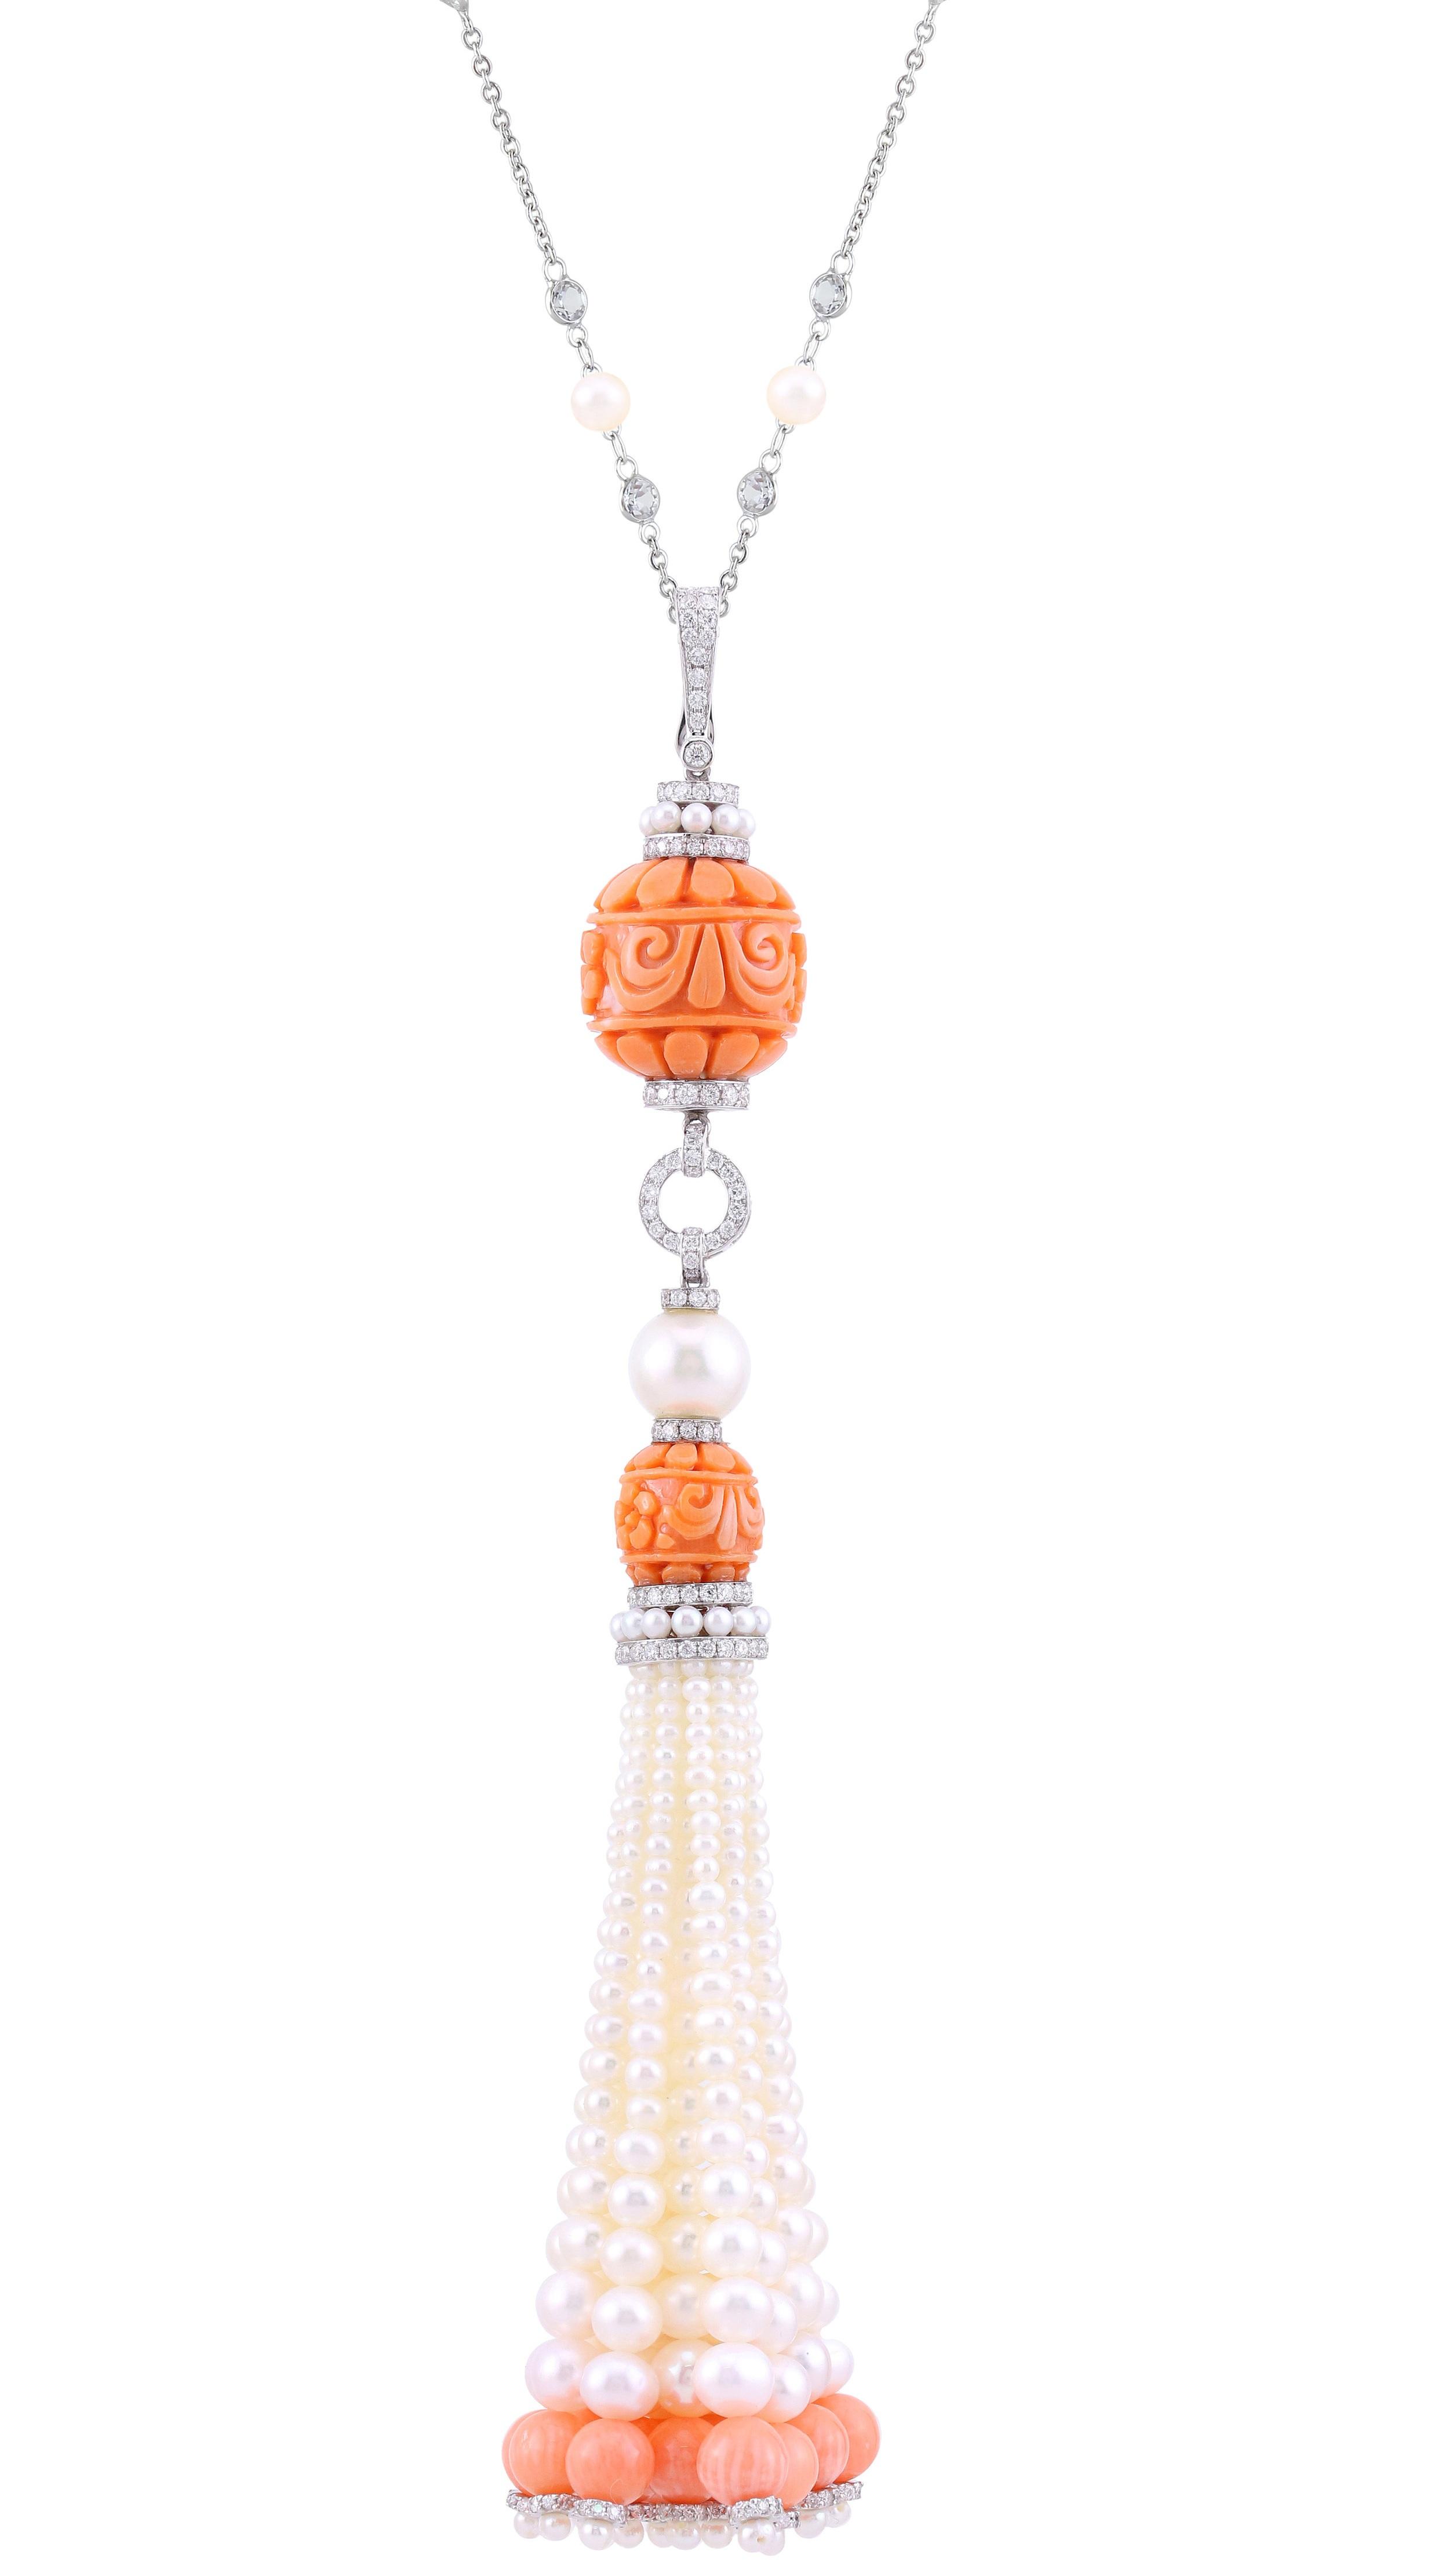 Stones:   -White Diamond Round Full Cut  -Peach Coral  -Pearl  -White Topaz